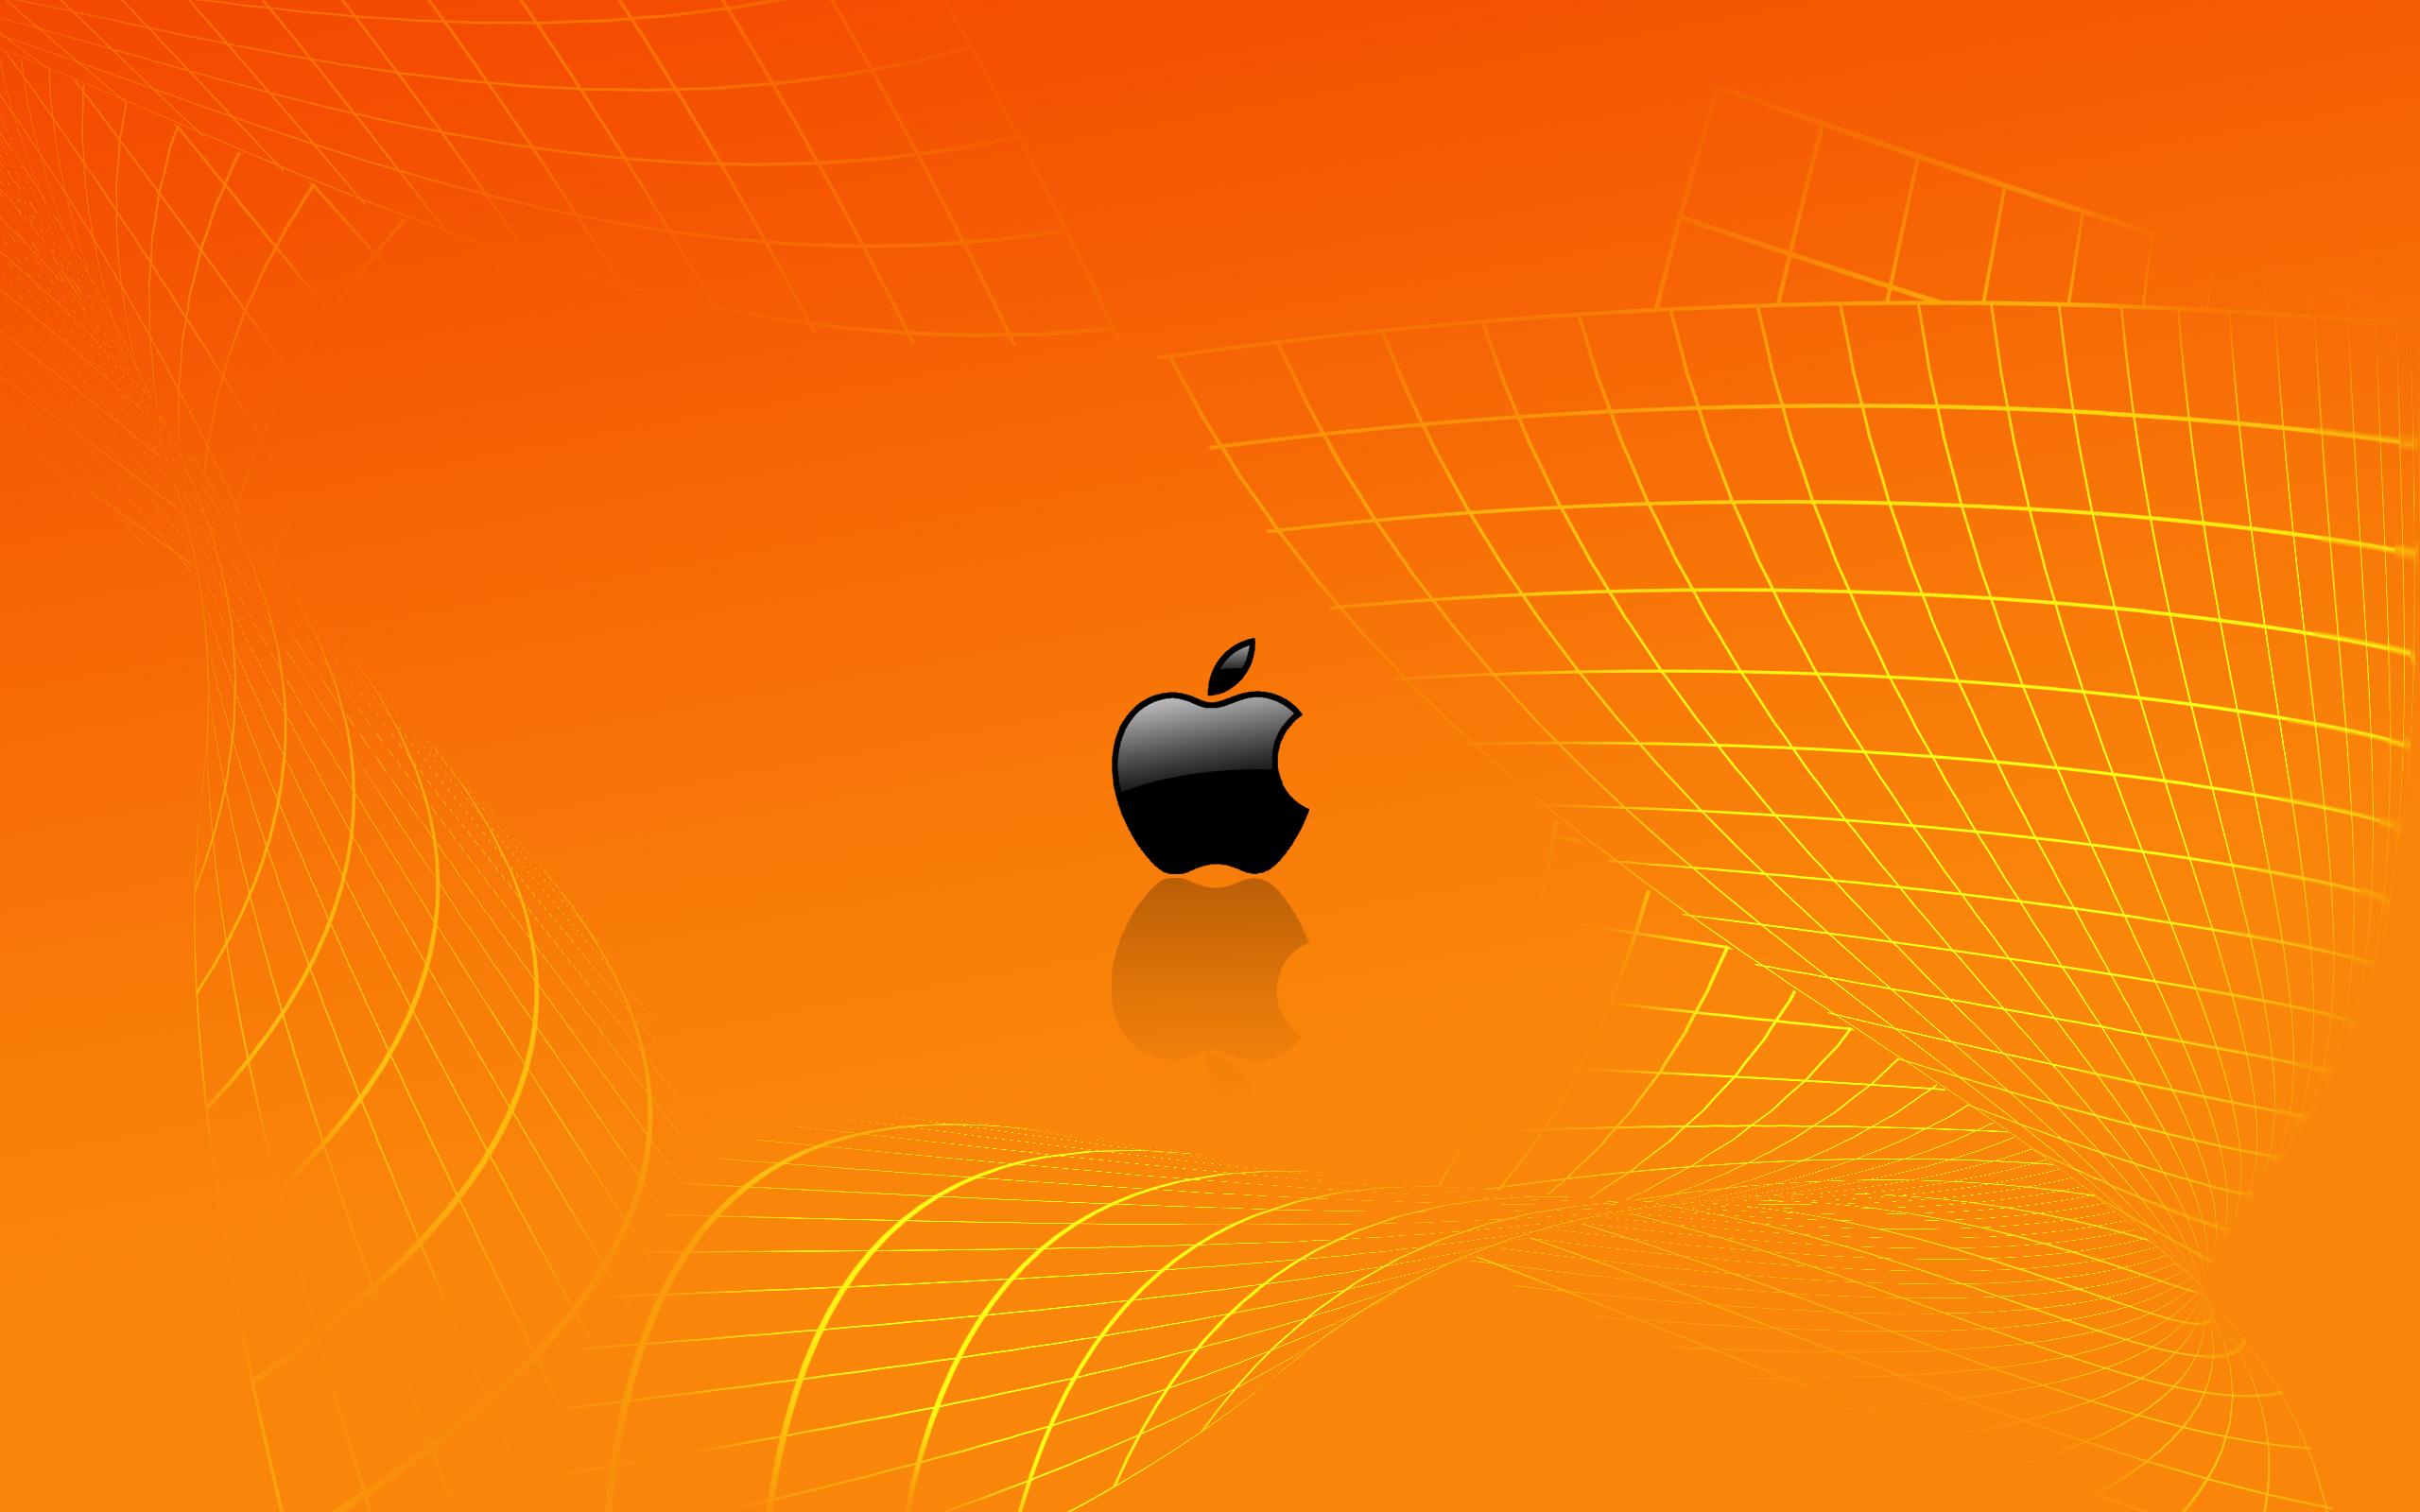 desktop backgrounds mac cool 2560x1600 2560x1600